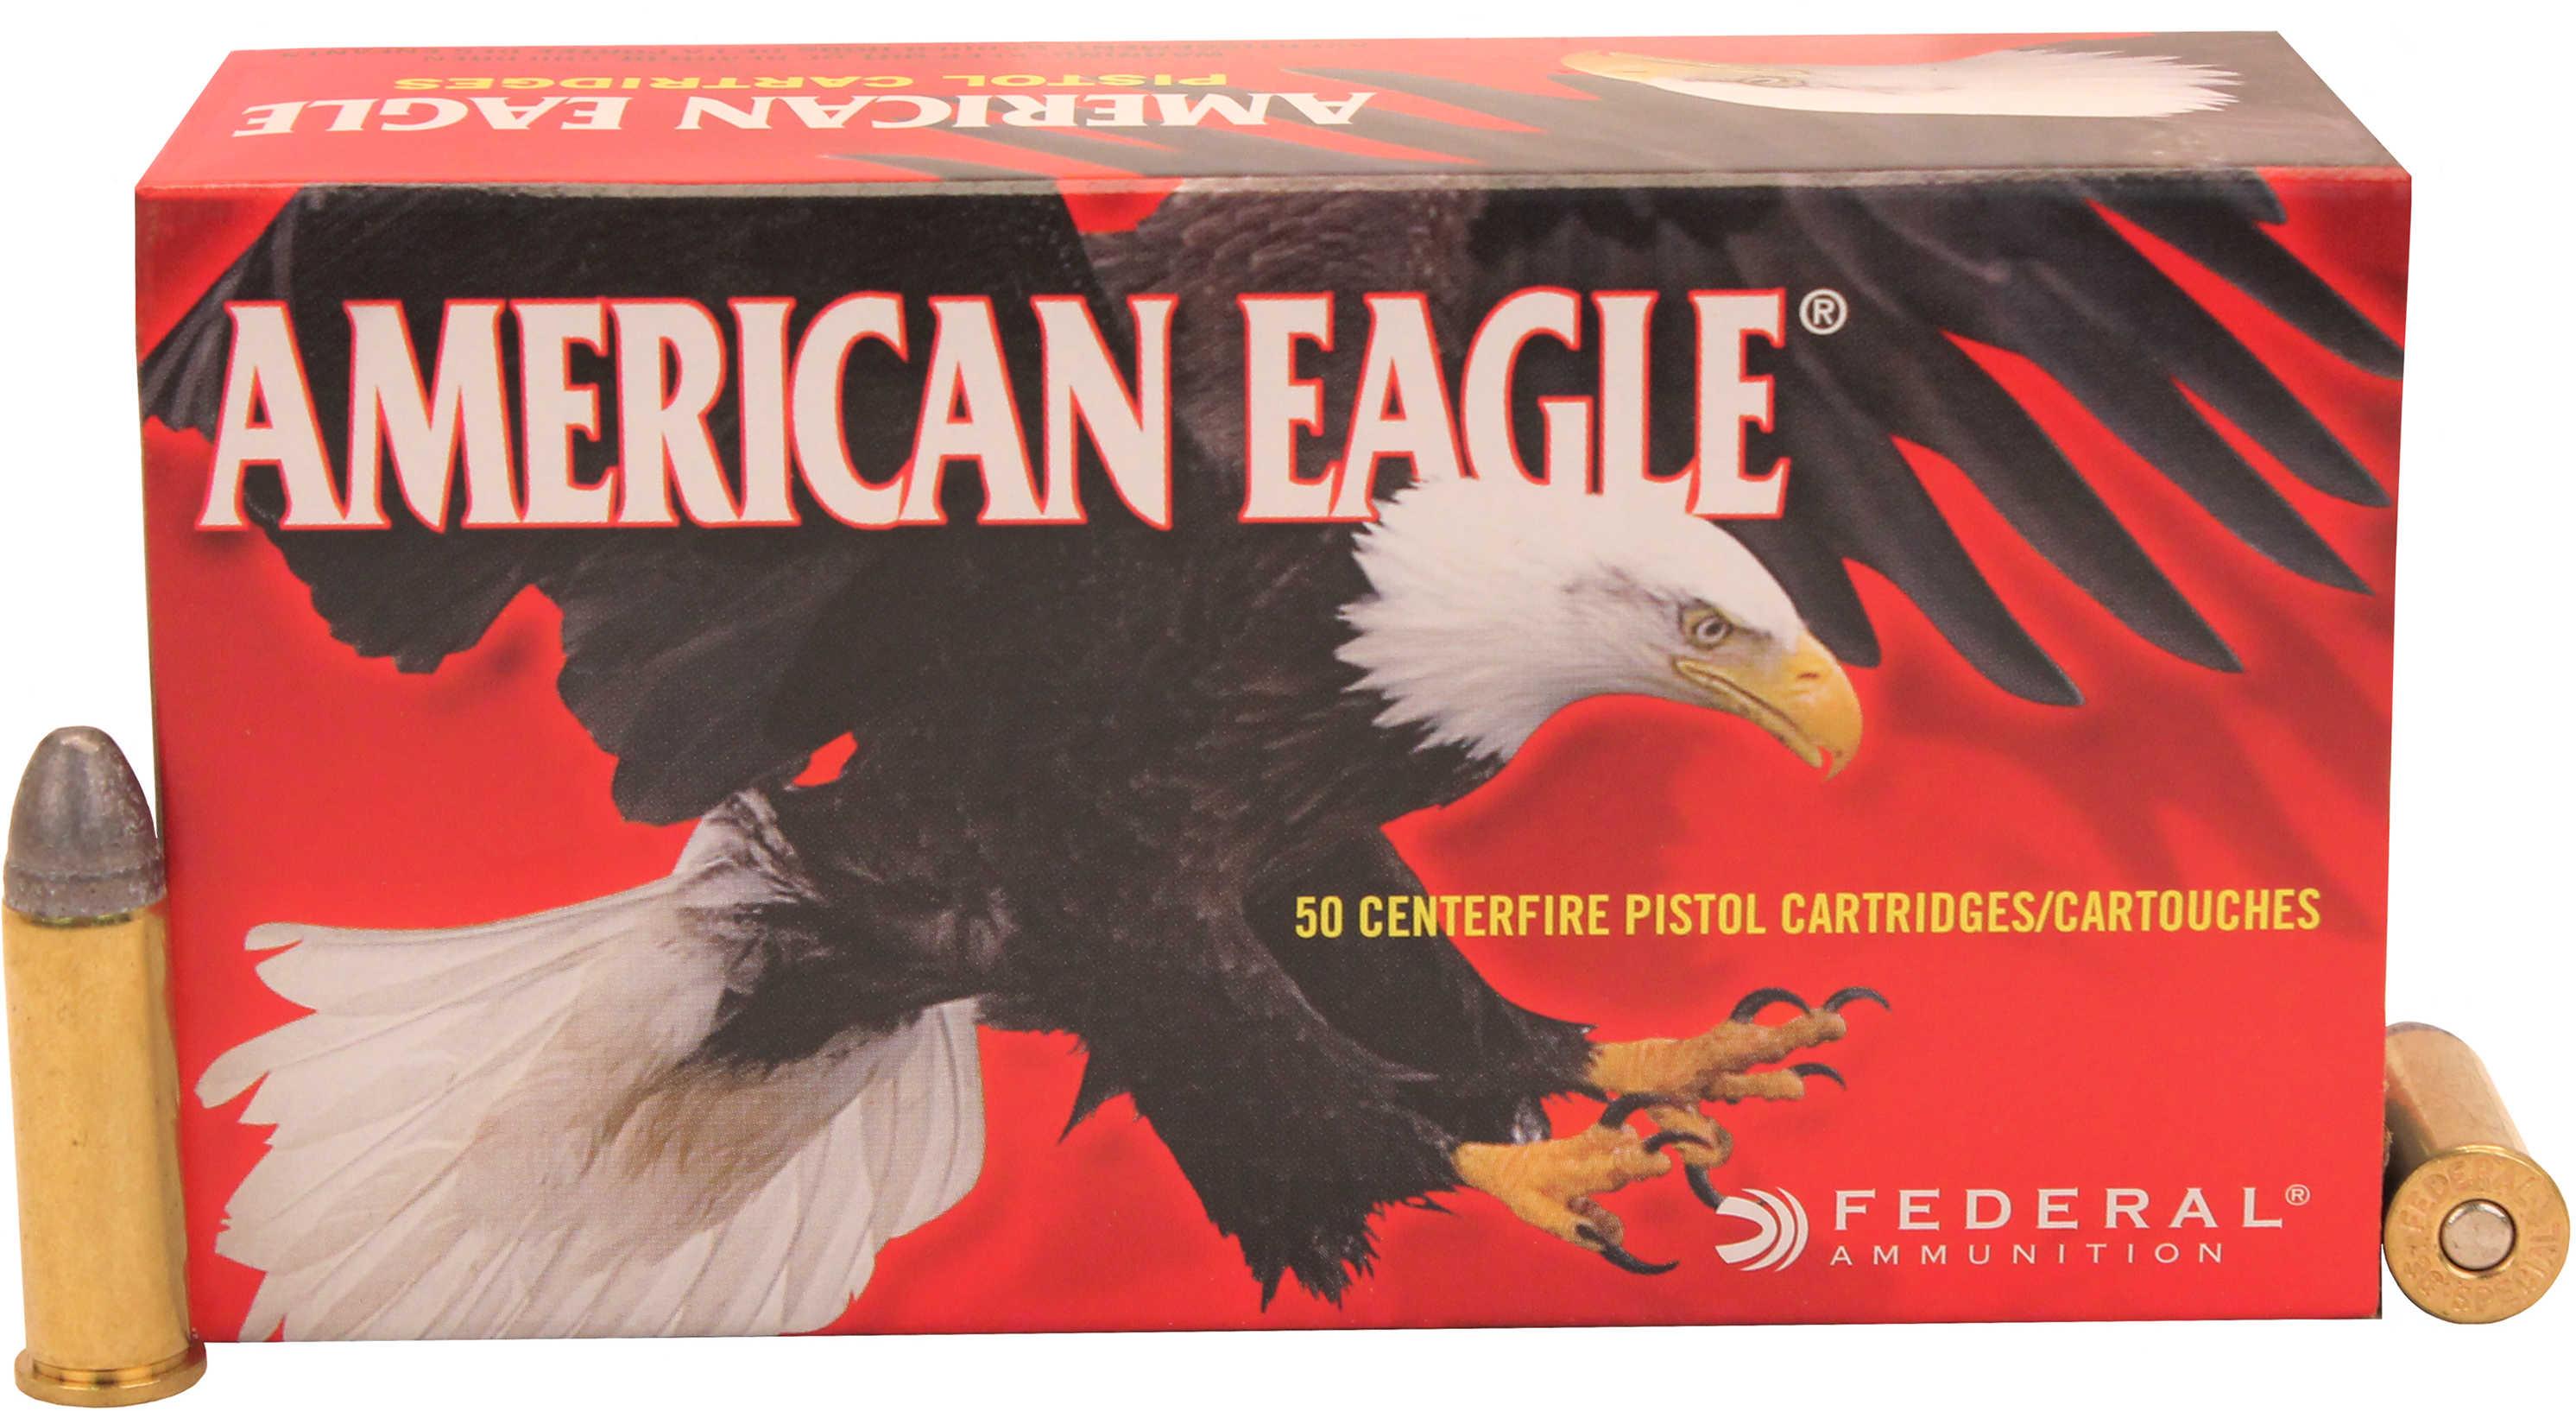 Federal Cartridge 38 Special 158 Grain Lead Round Nose (Per 50) AE38B